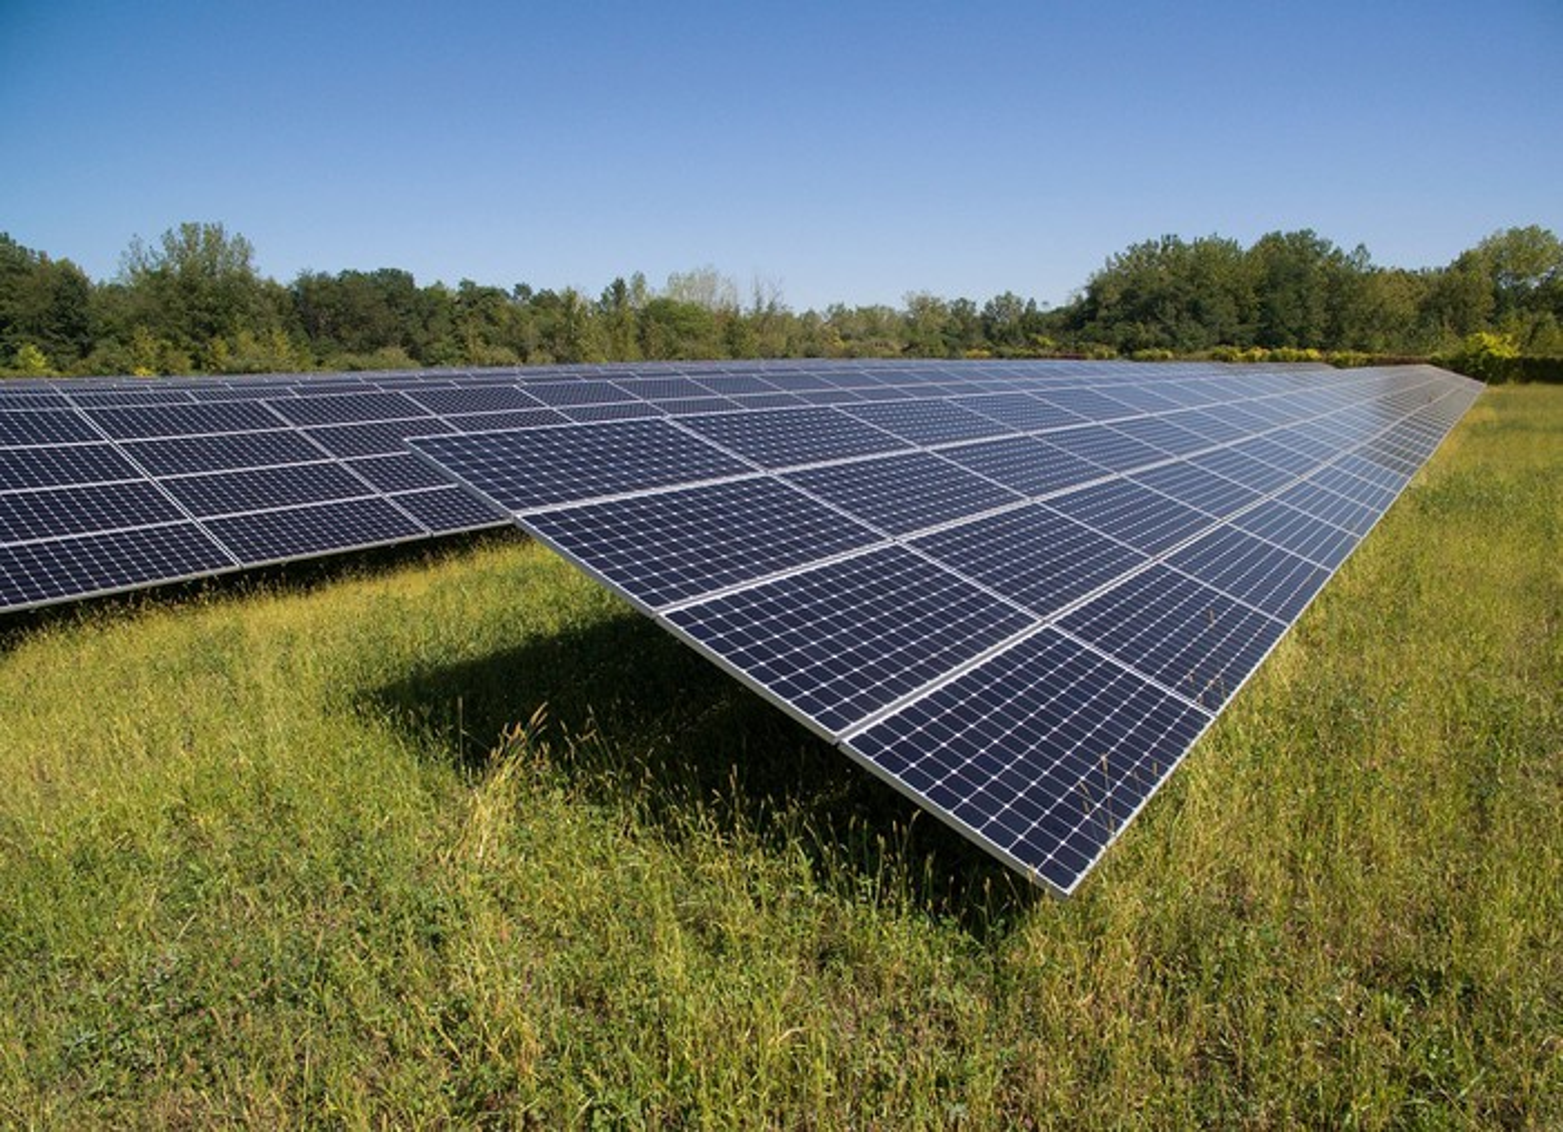 Utility-scale solar installation in a field.